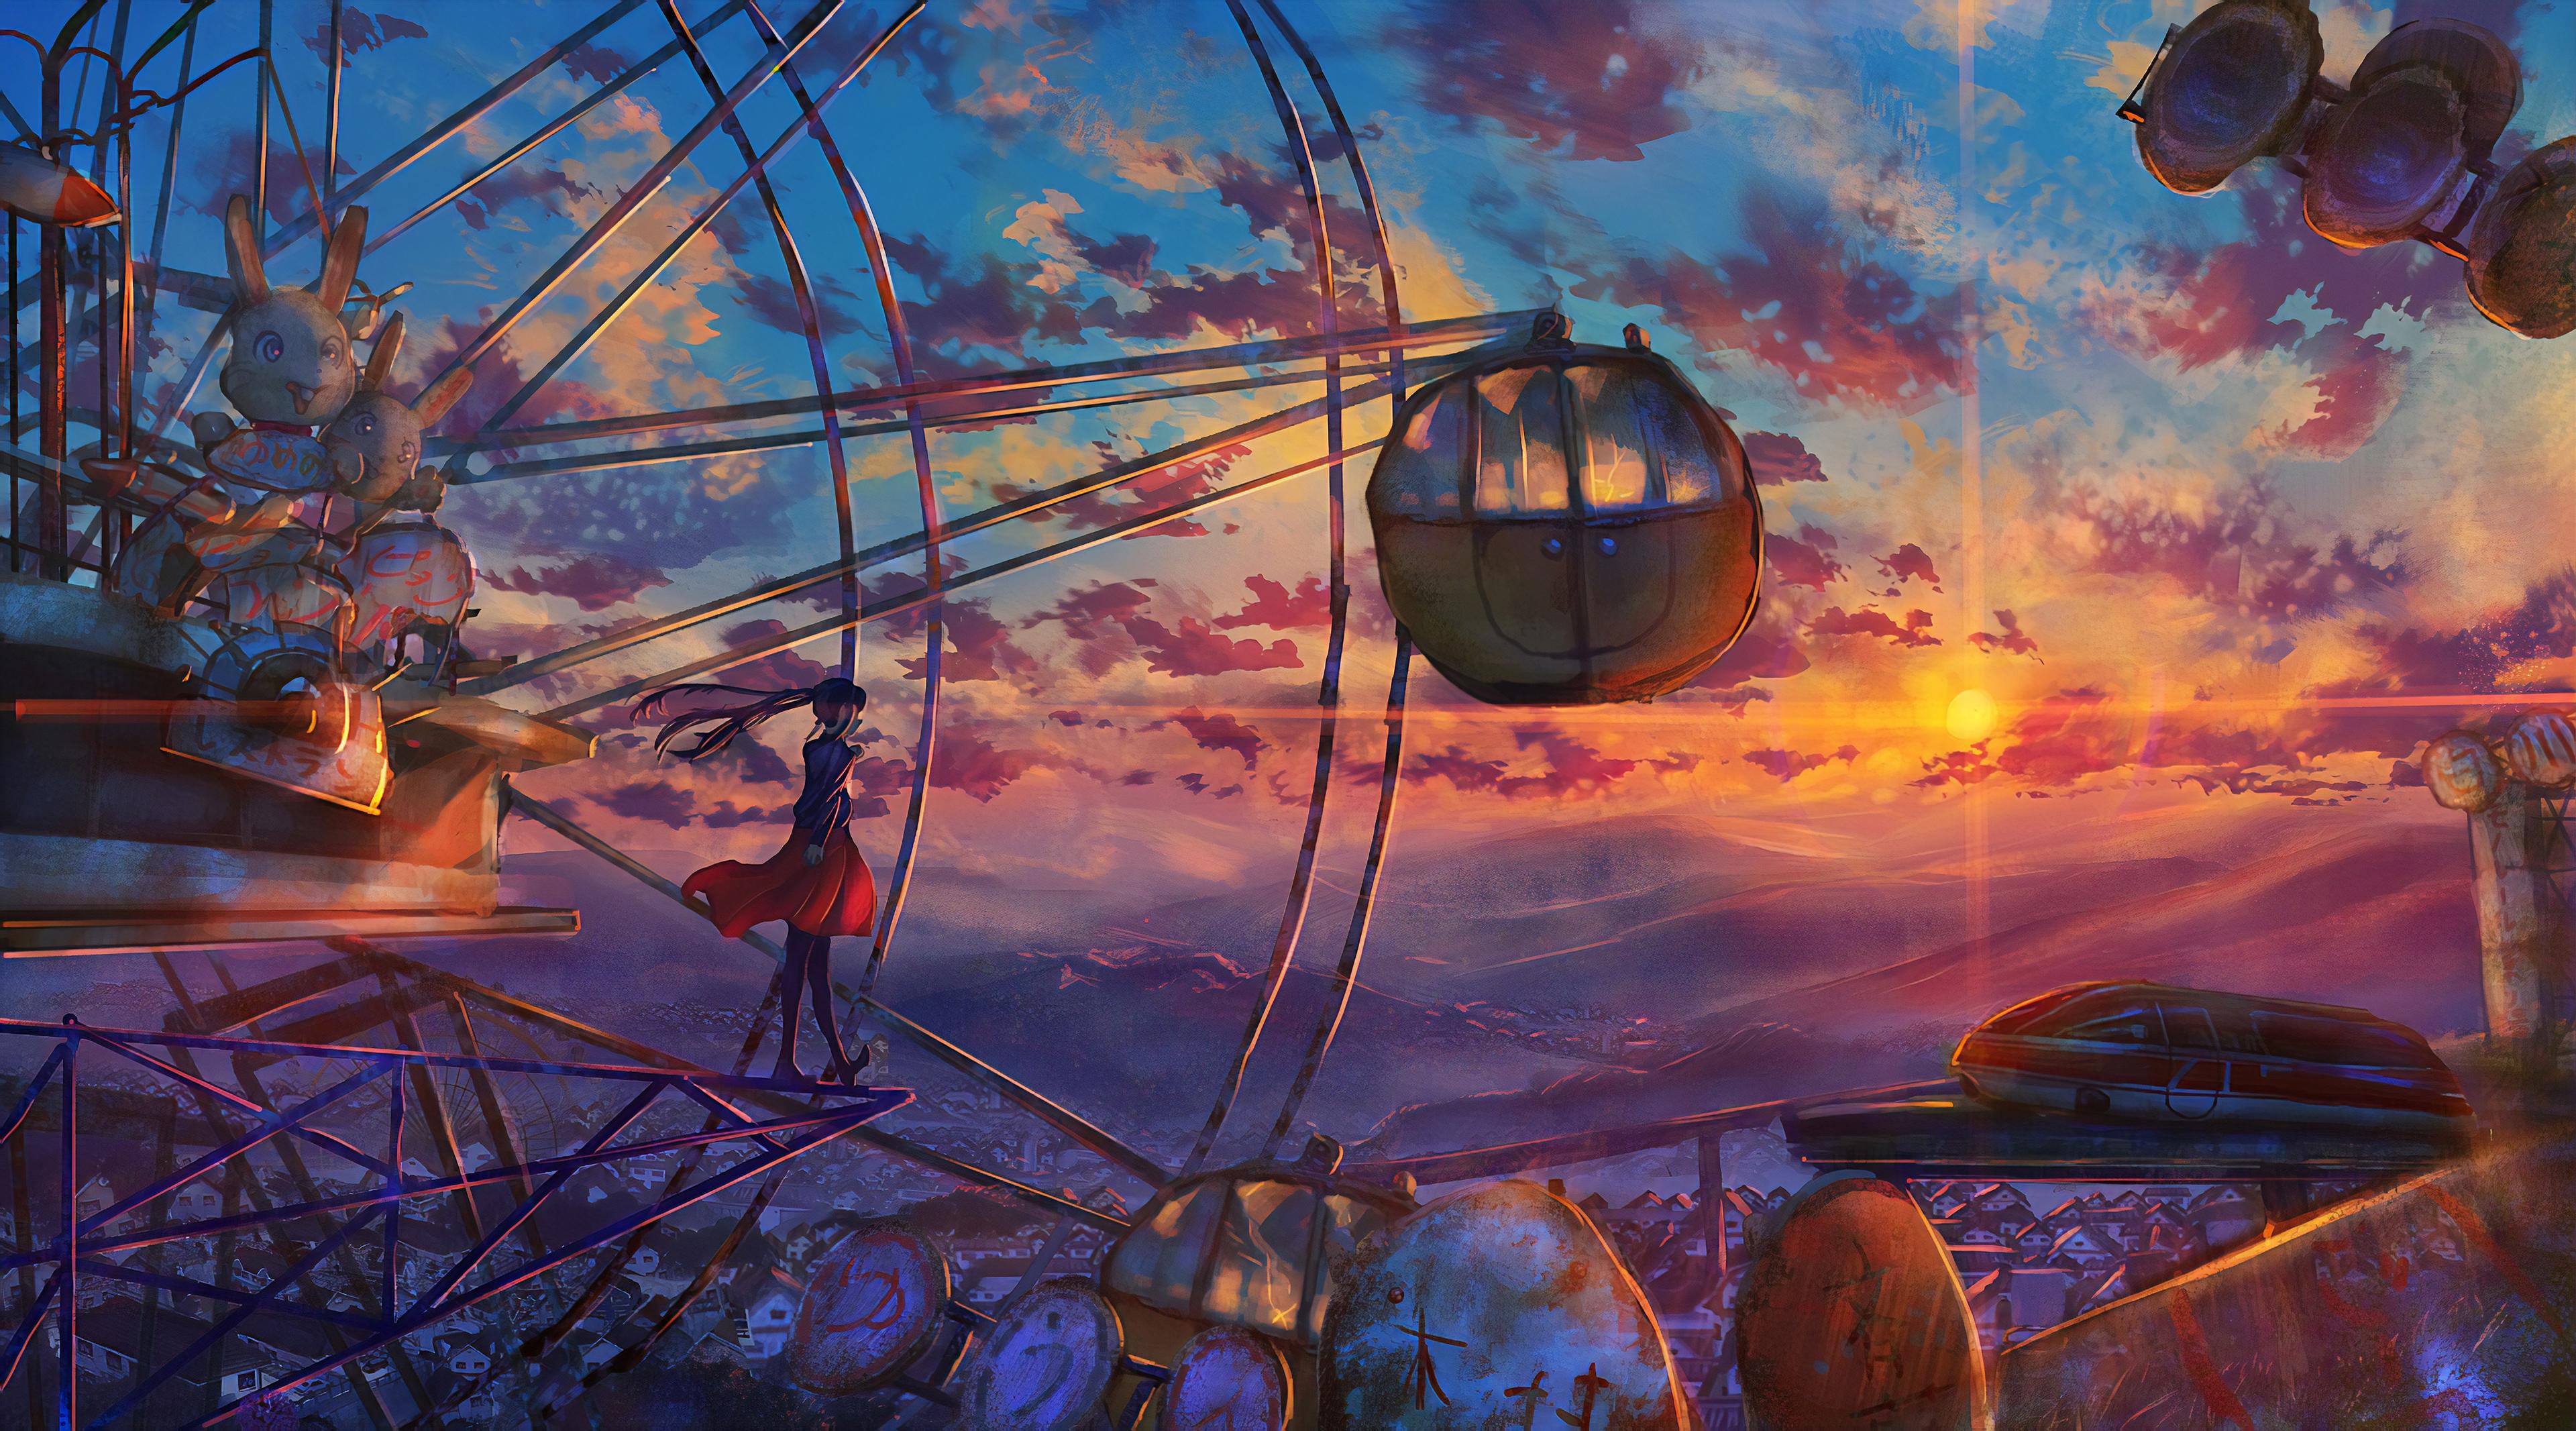 Anime Ferris Wheel Painting, HD Anime, 4k Wallpapers ...